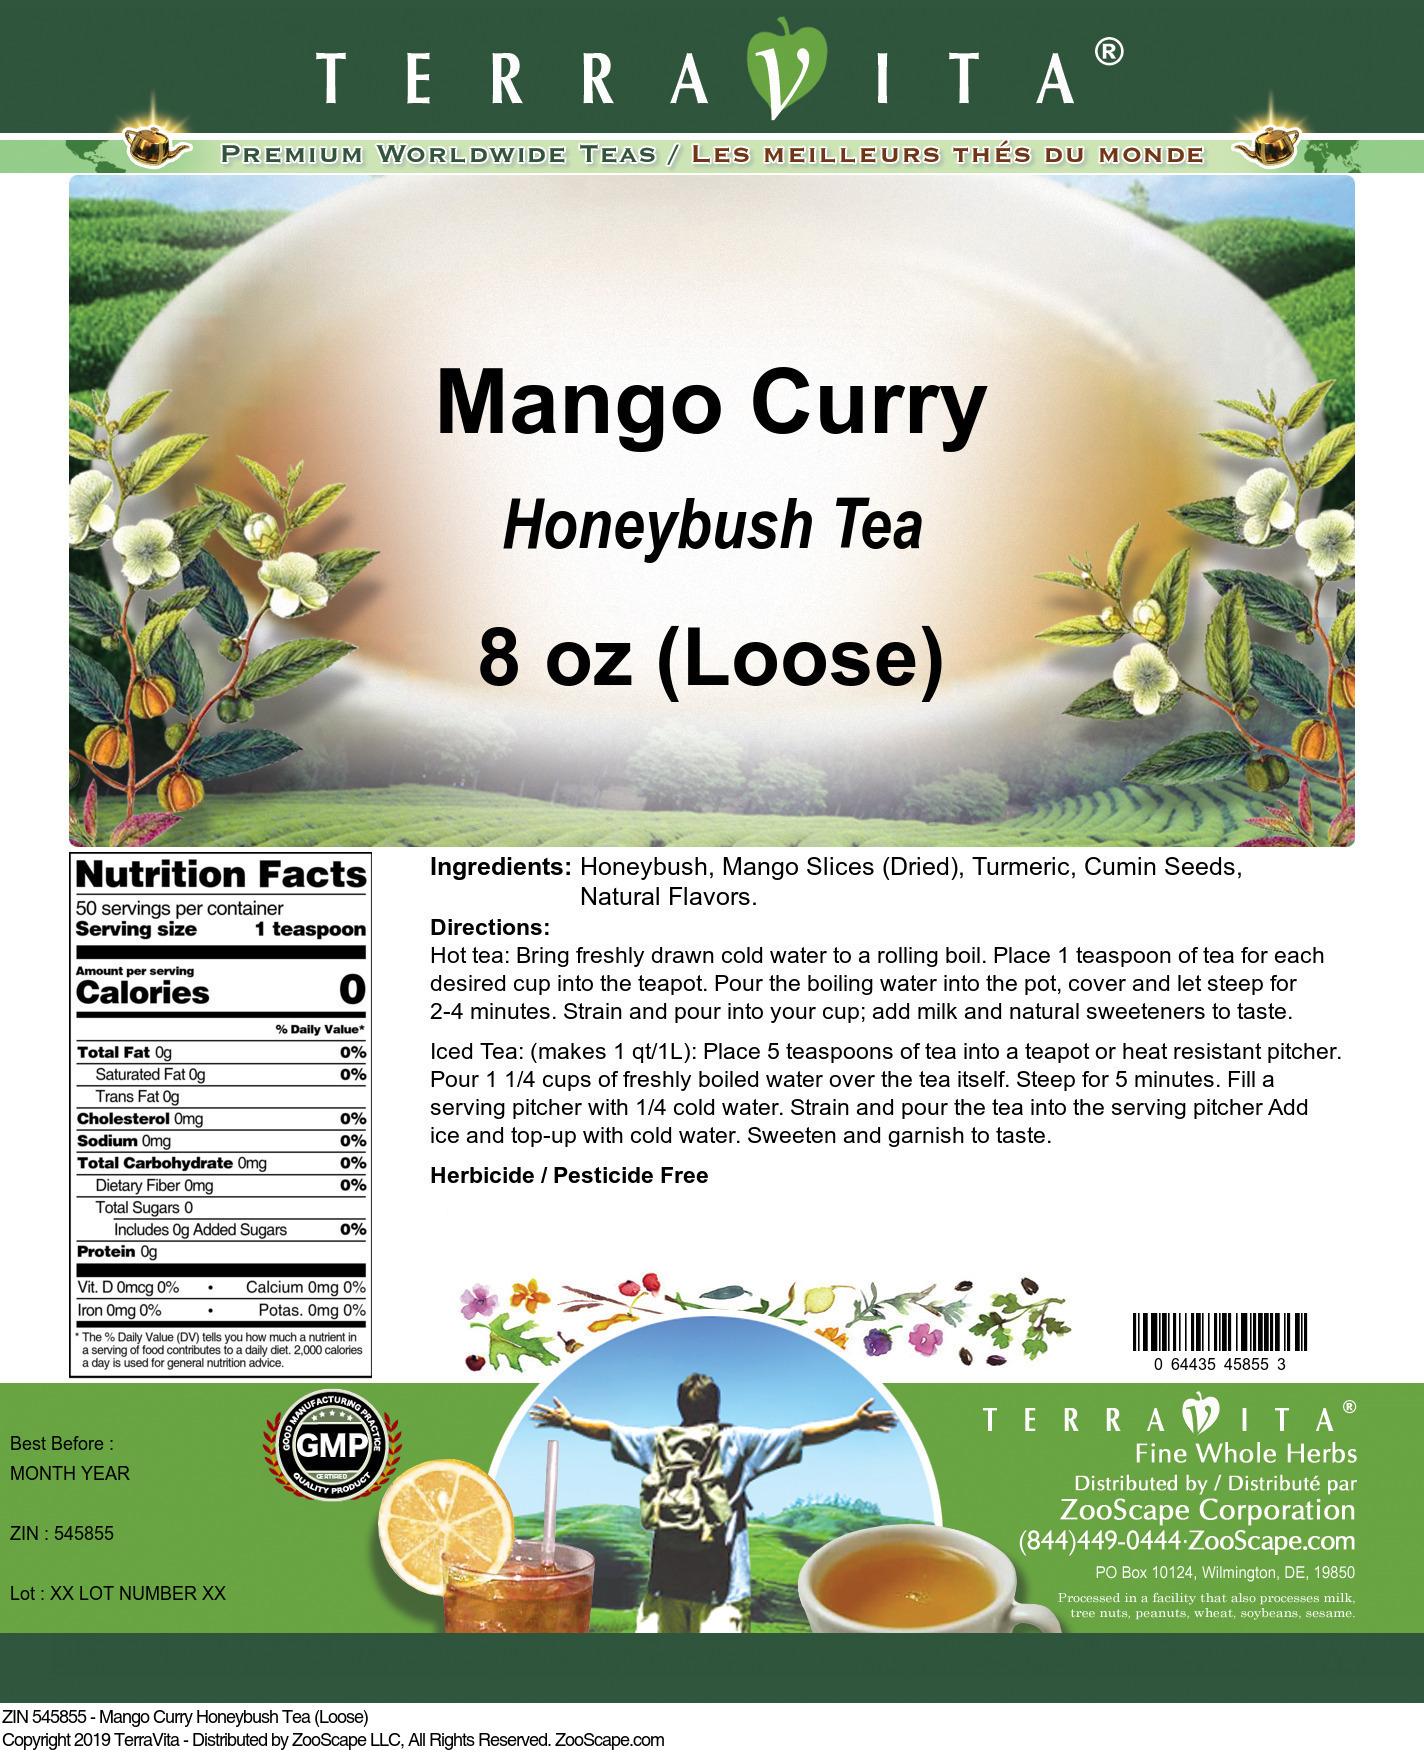 Mango Curry Honeybush Tea (Loose)